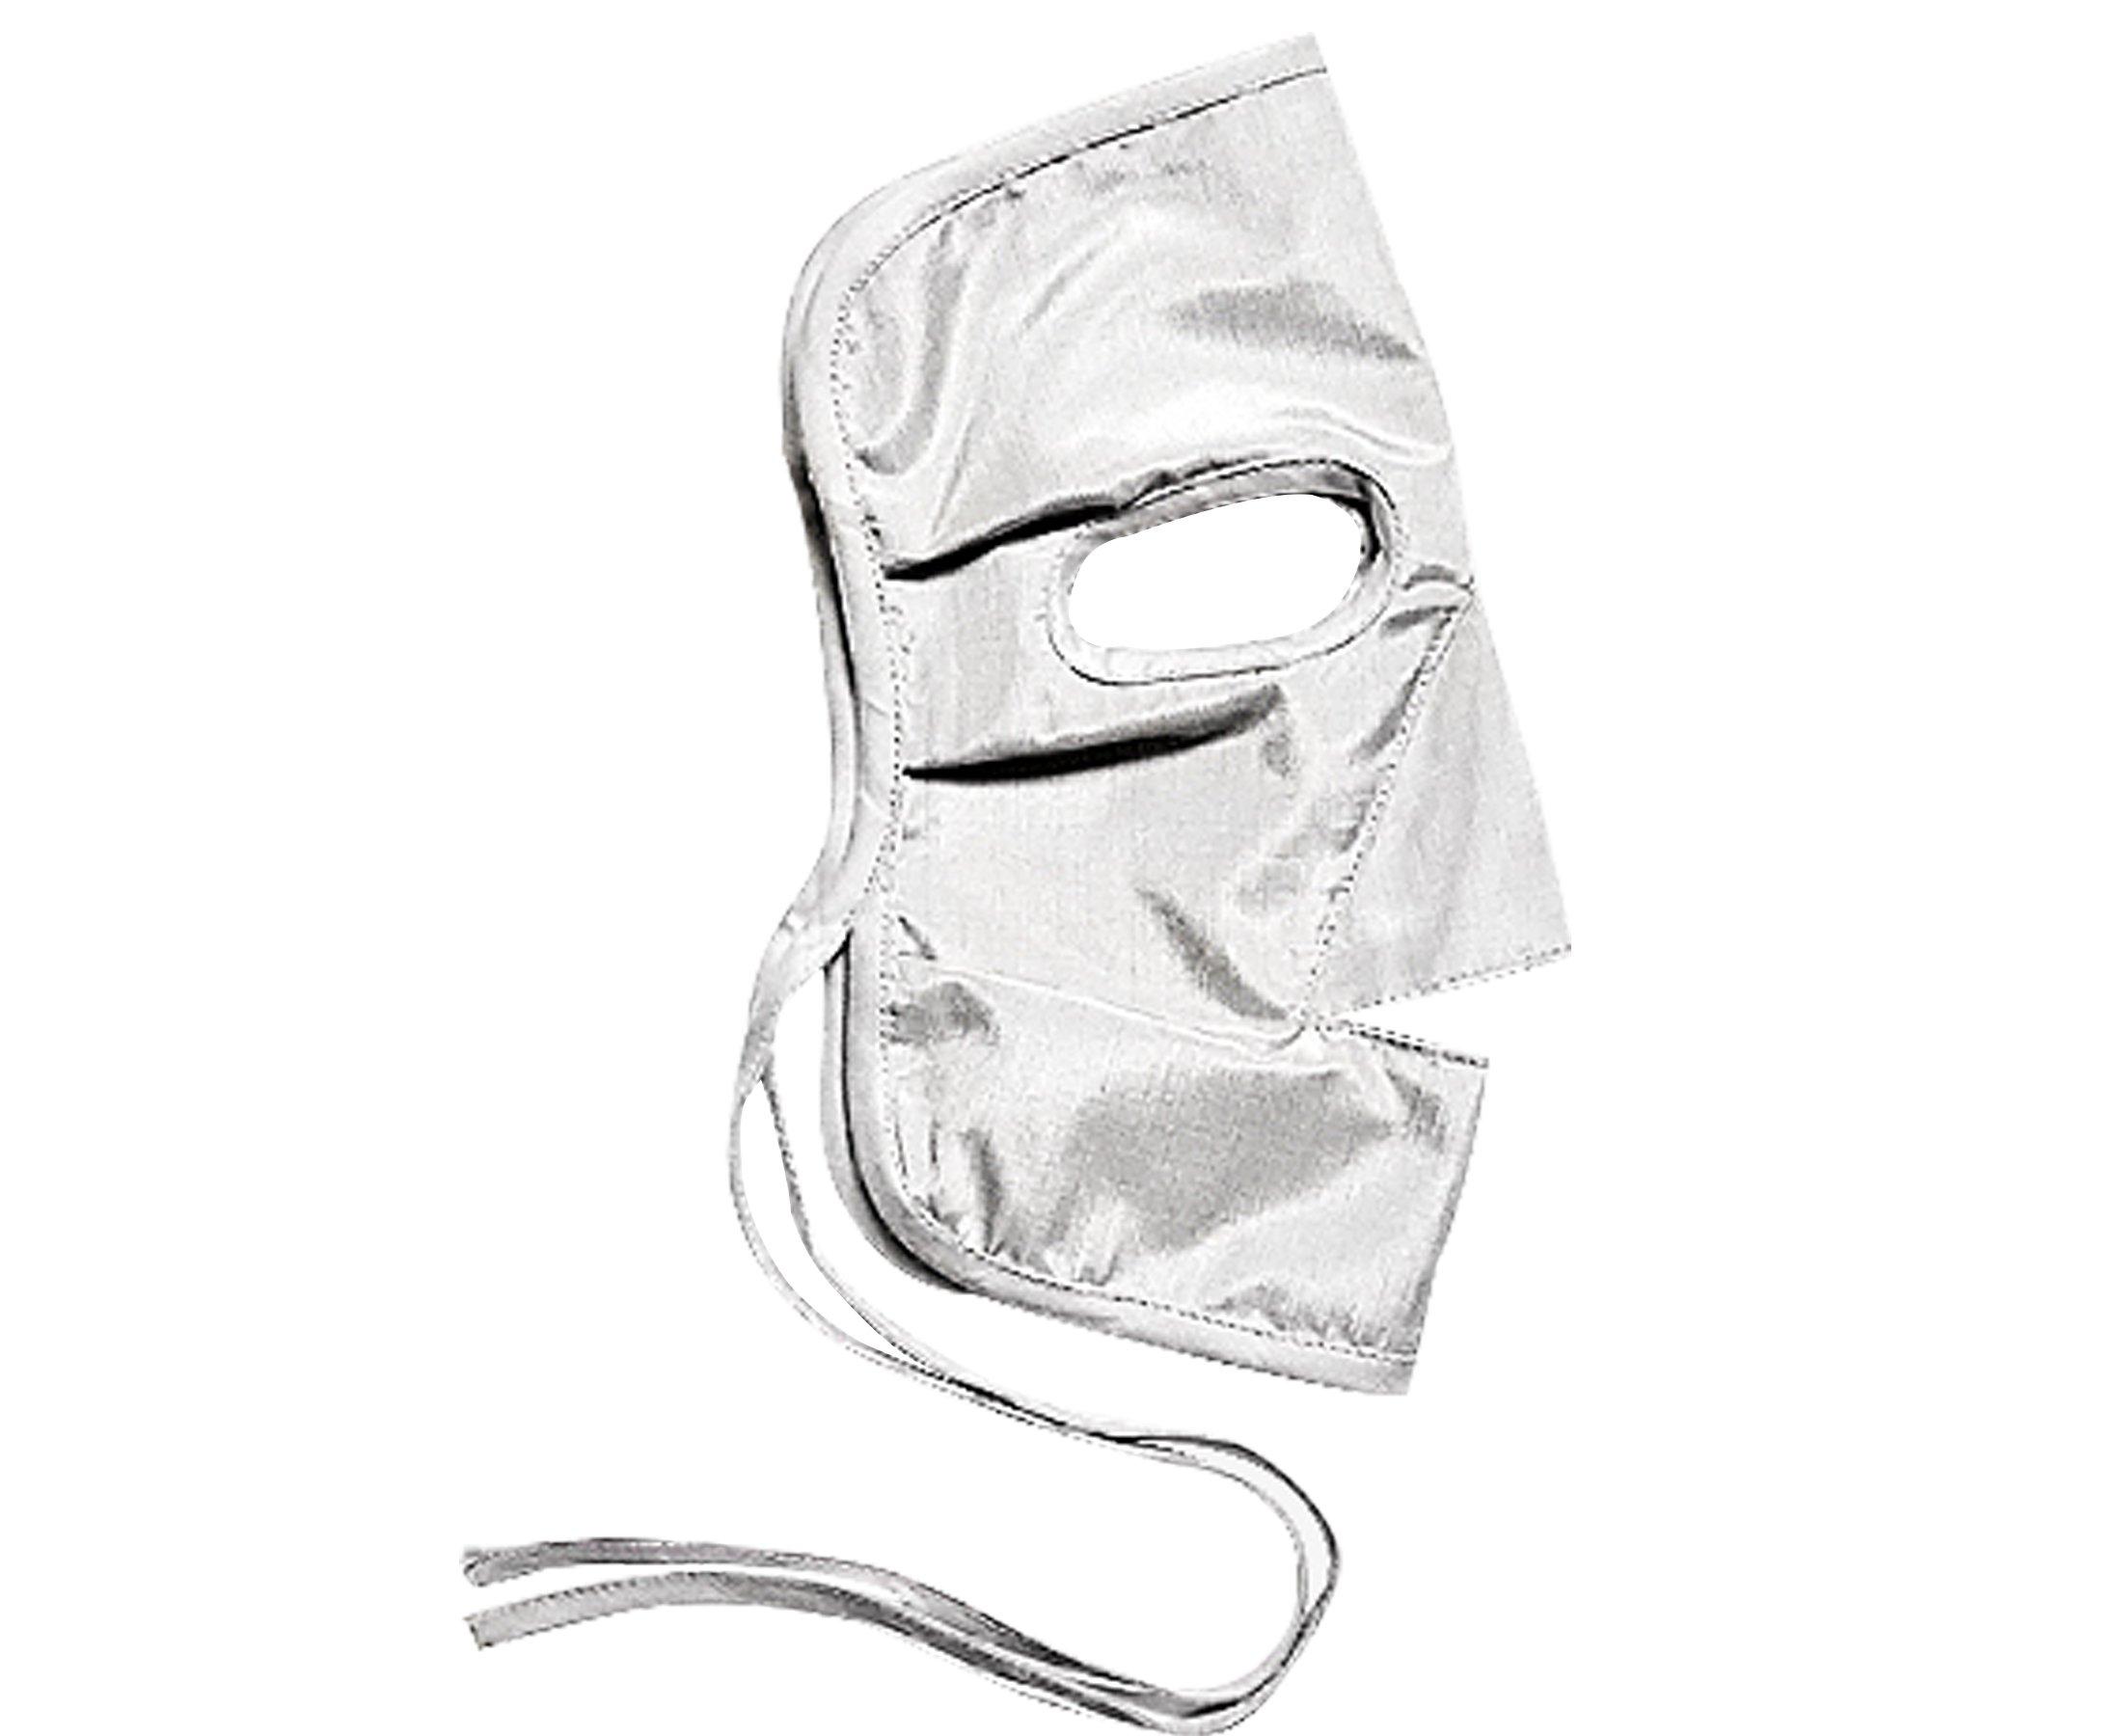 LVFEIER Anti-radiation mask breathable skin care Internet protection computer radiation masks men and women silver fiber sunscreen Masks